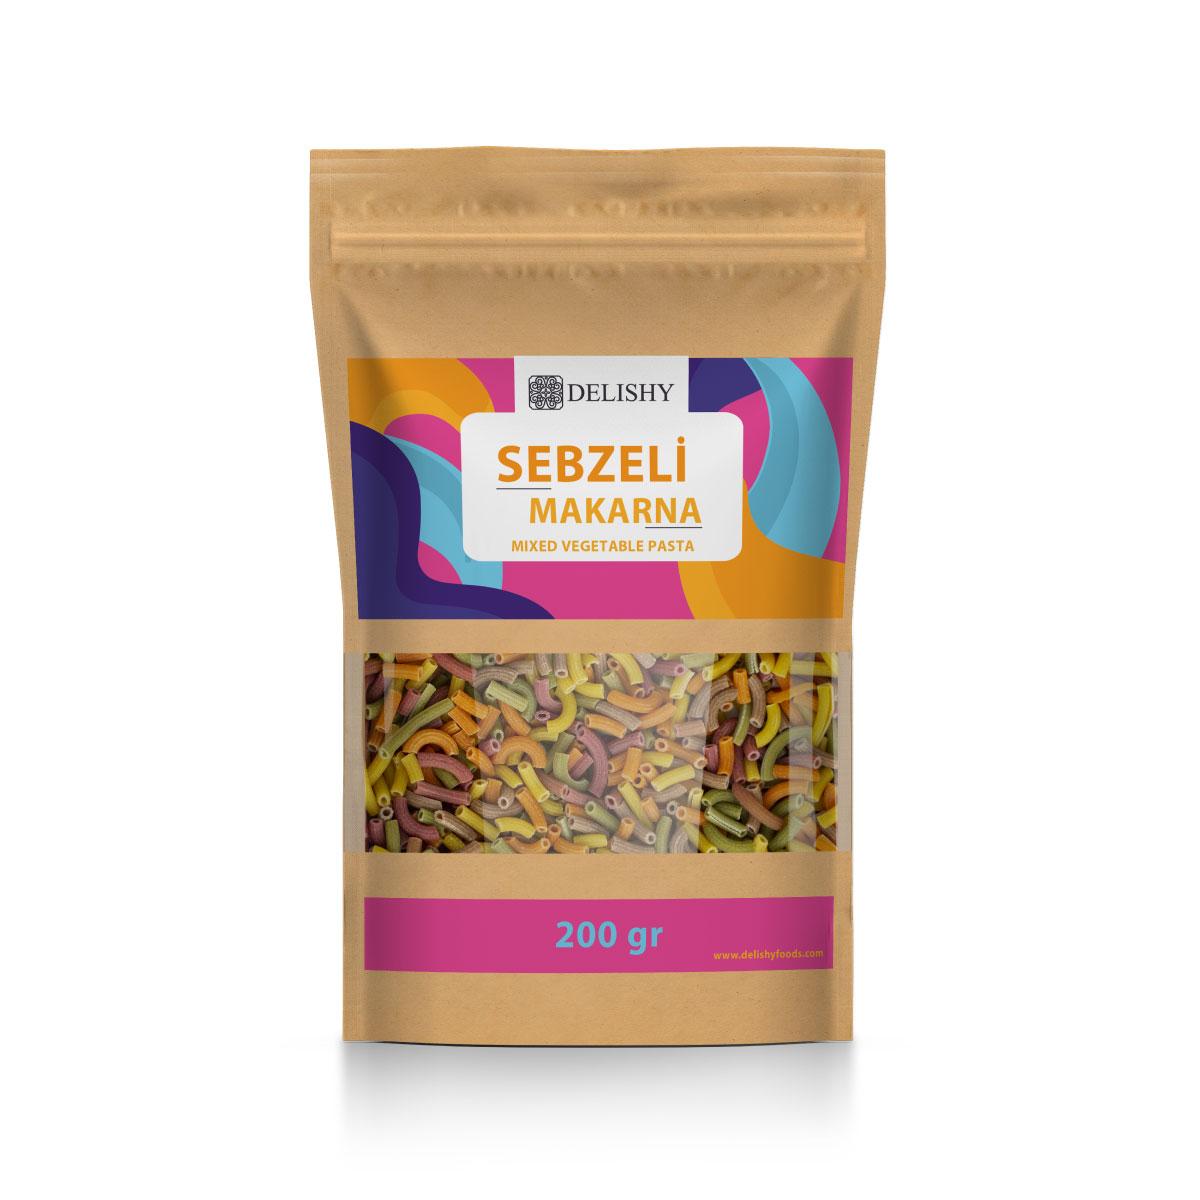 Delishy Mixed Vegetable Pasta (200g)